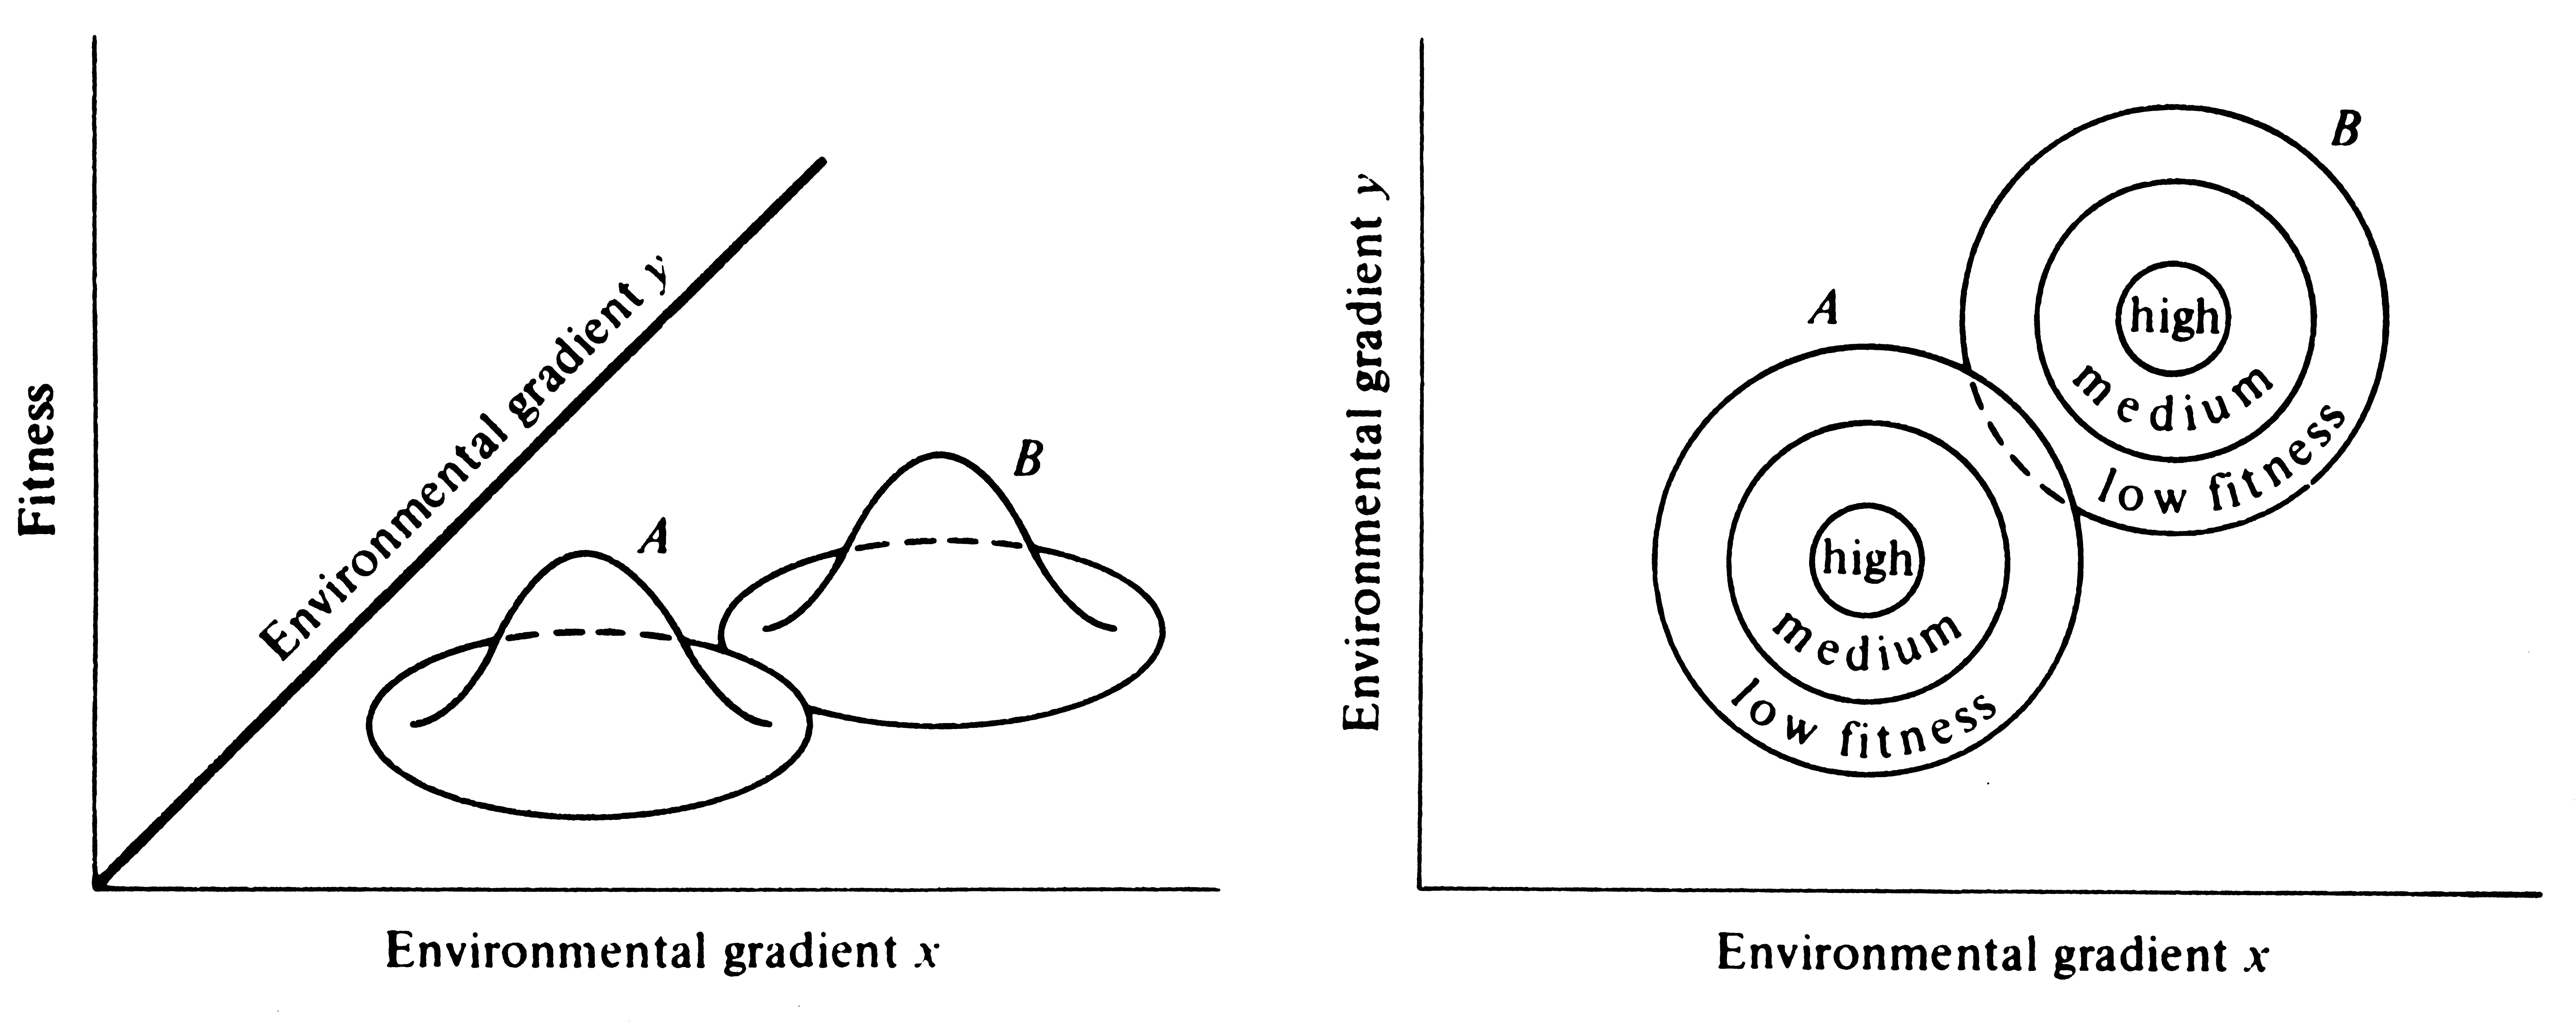 Six Levels Of Ecology - webmart.me